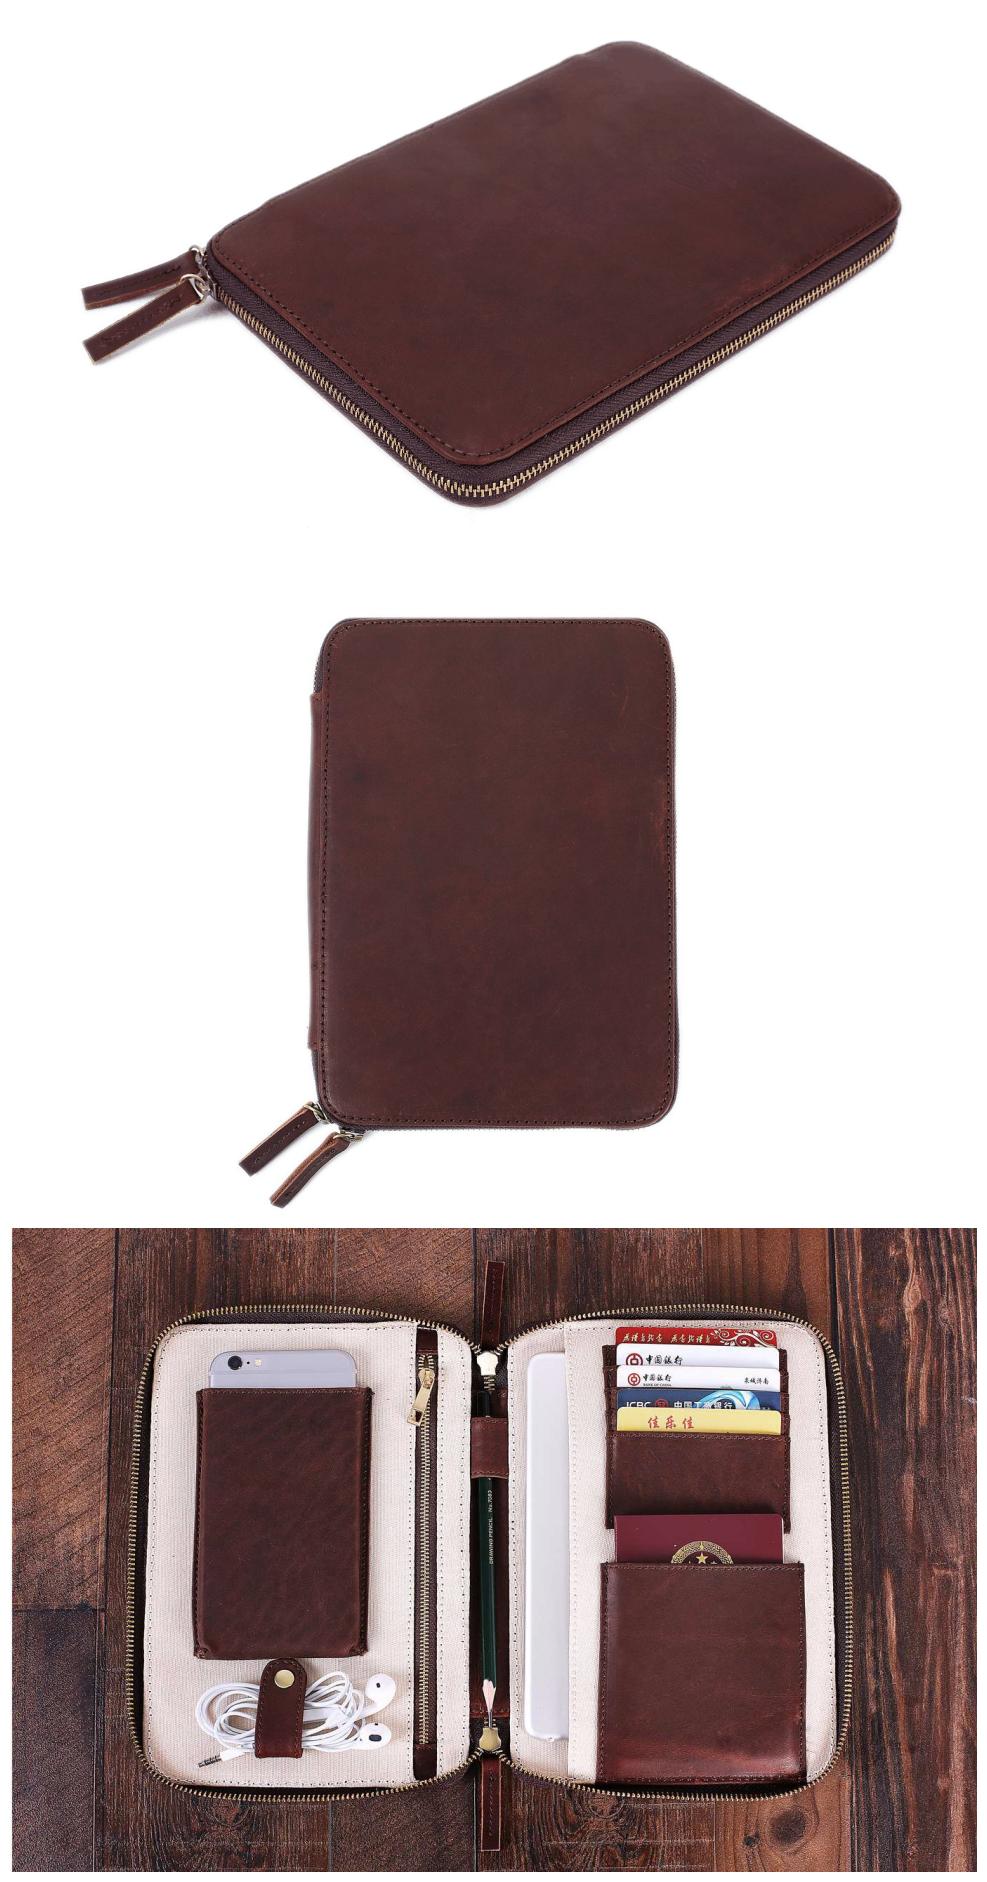 Sheep No More Multi-purpose Travel Passport Set With Storage Bag Leather Passport Holder Passport Holder With Passport Holder Travel Wallet